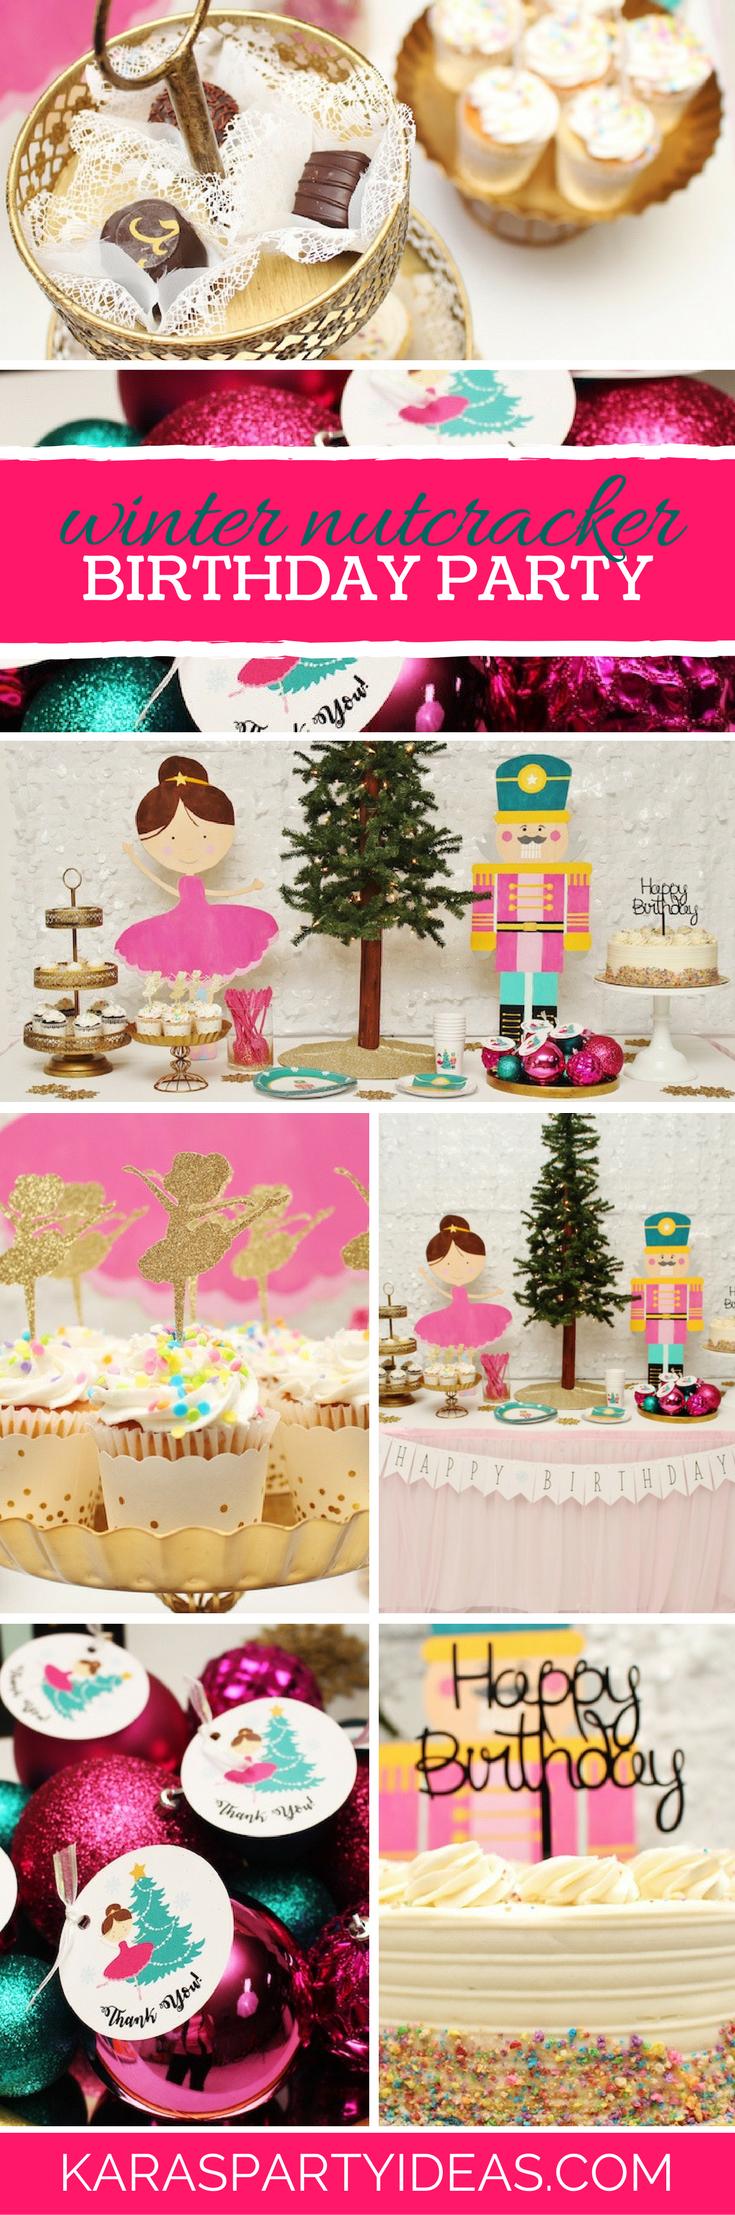 Winter Nutcracker Birthday Party via Kara's Party Ideas - KarasPartyIdeas.com